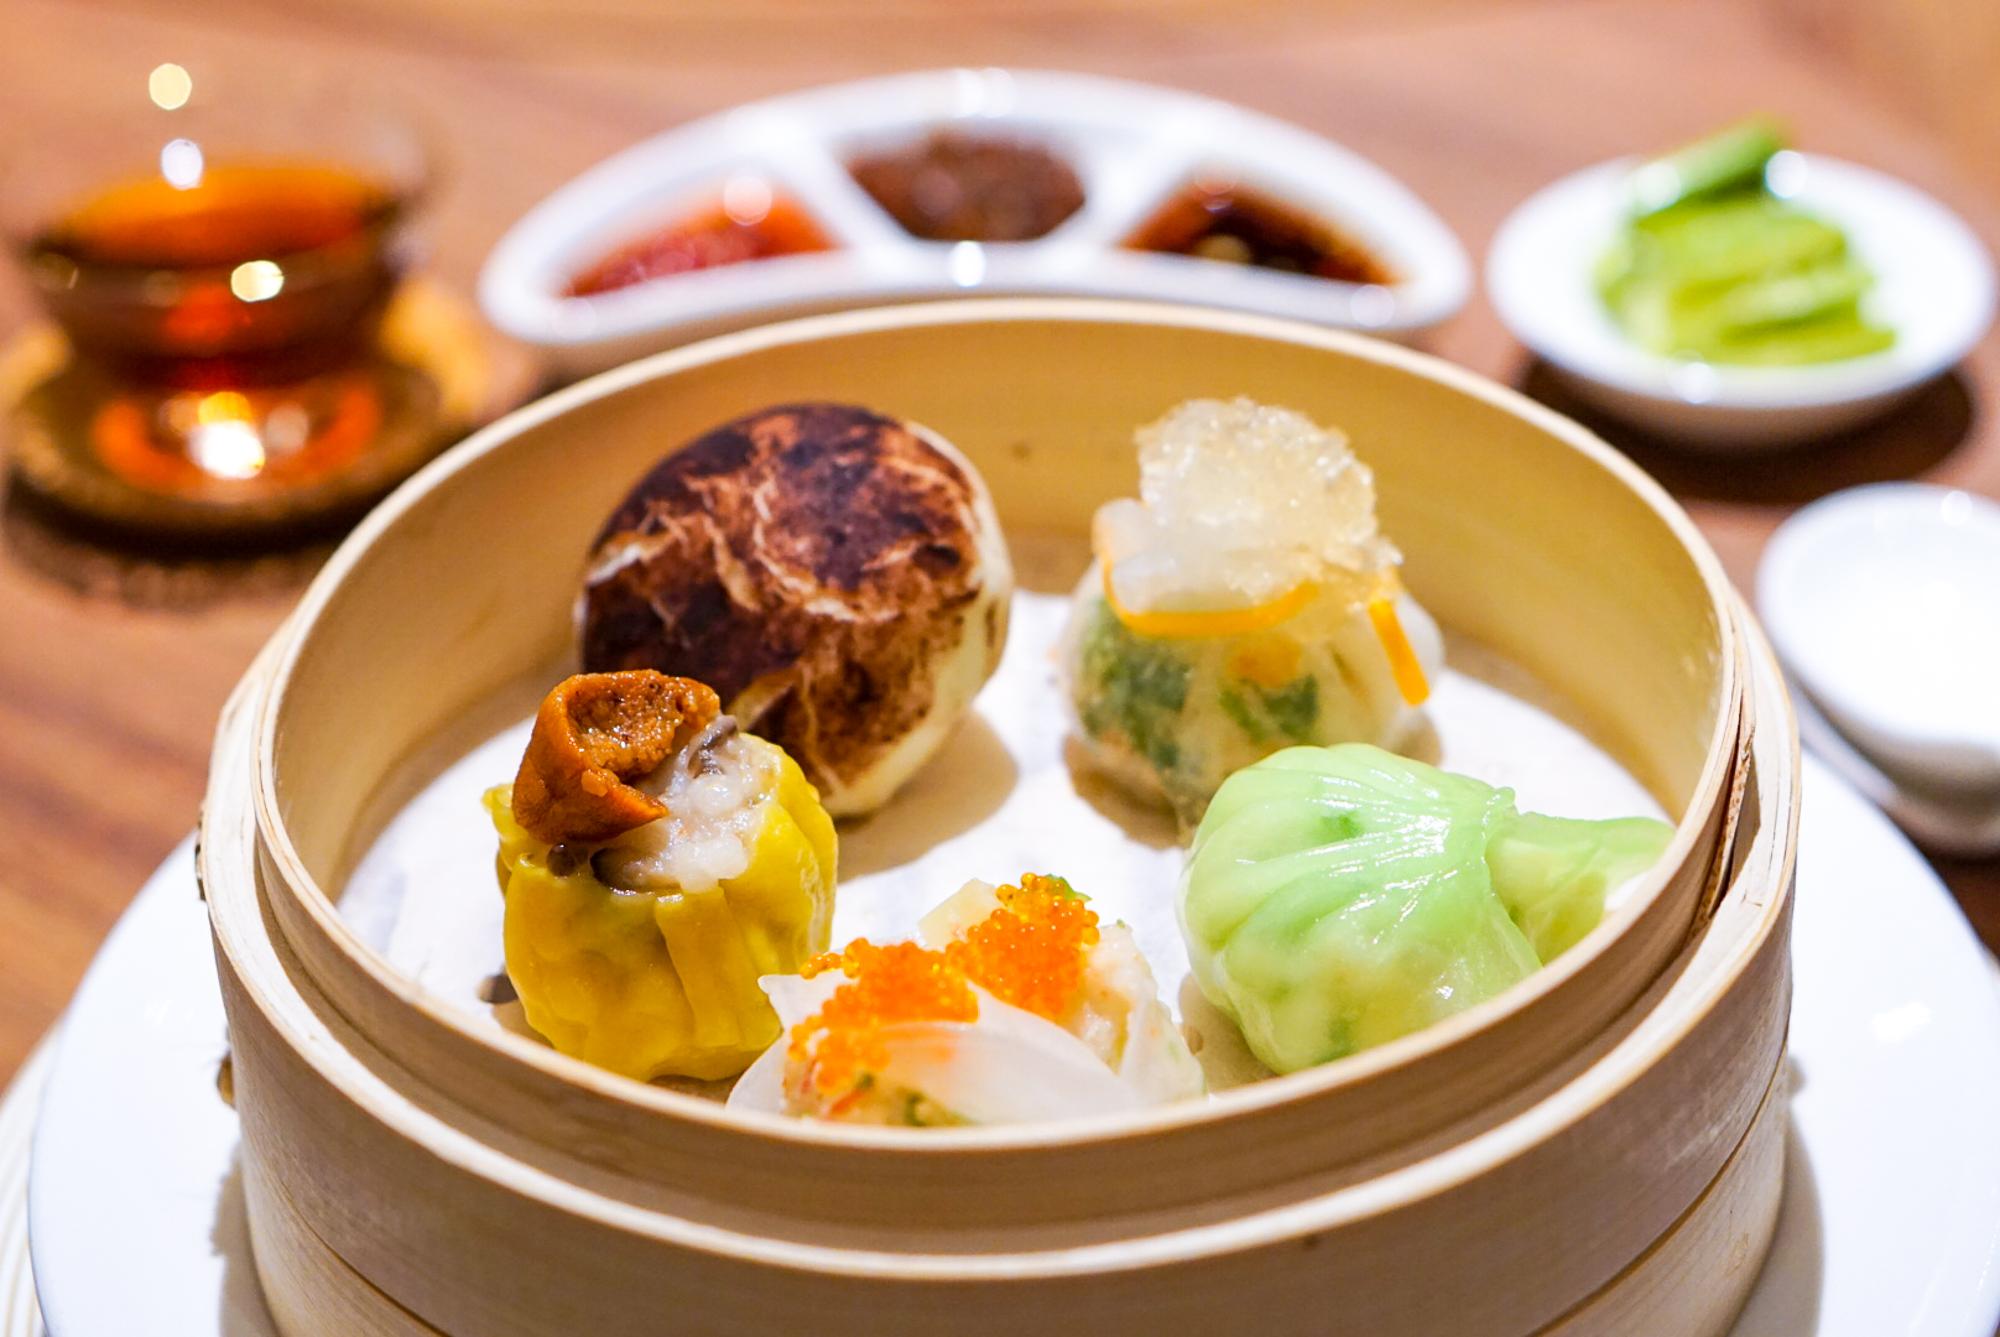 Si Chuan Dou Hua Grand Dim Sum Brunch - Decadent spin on classic favourites 2